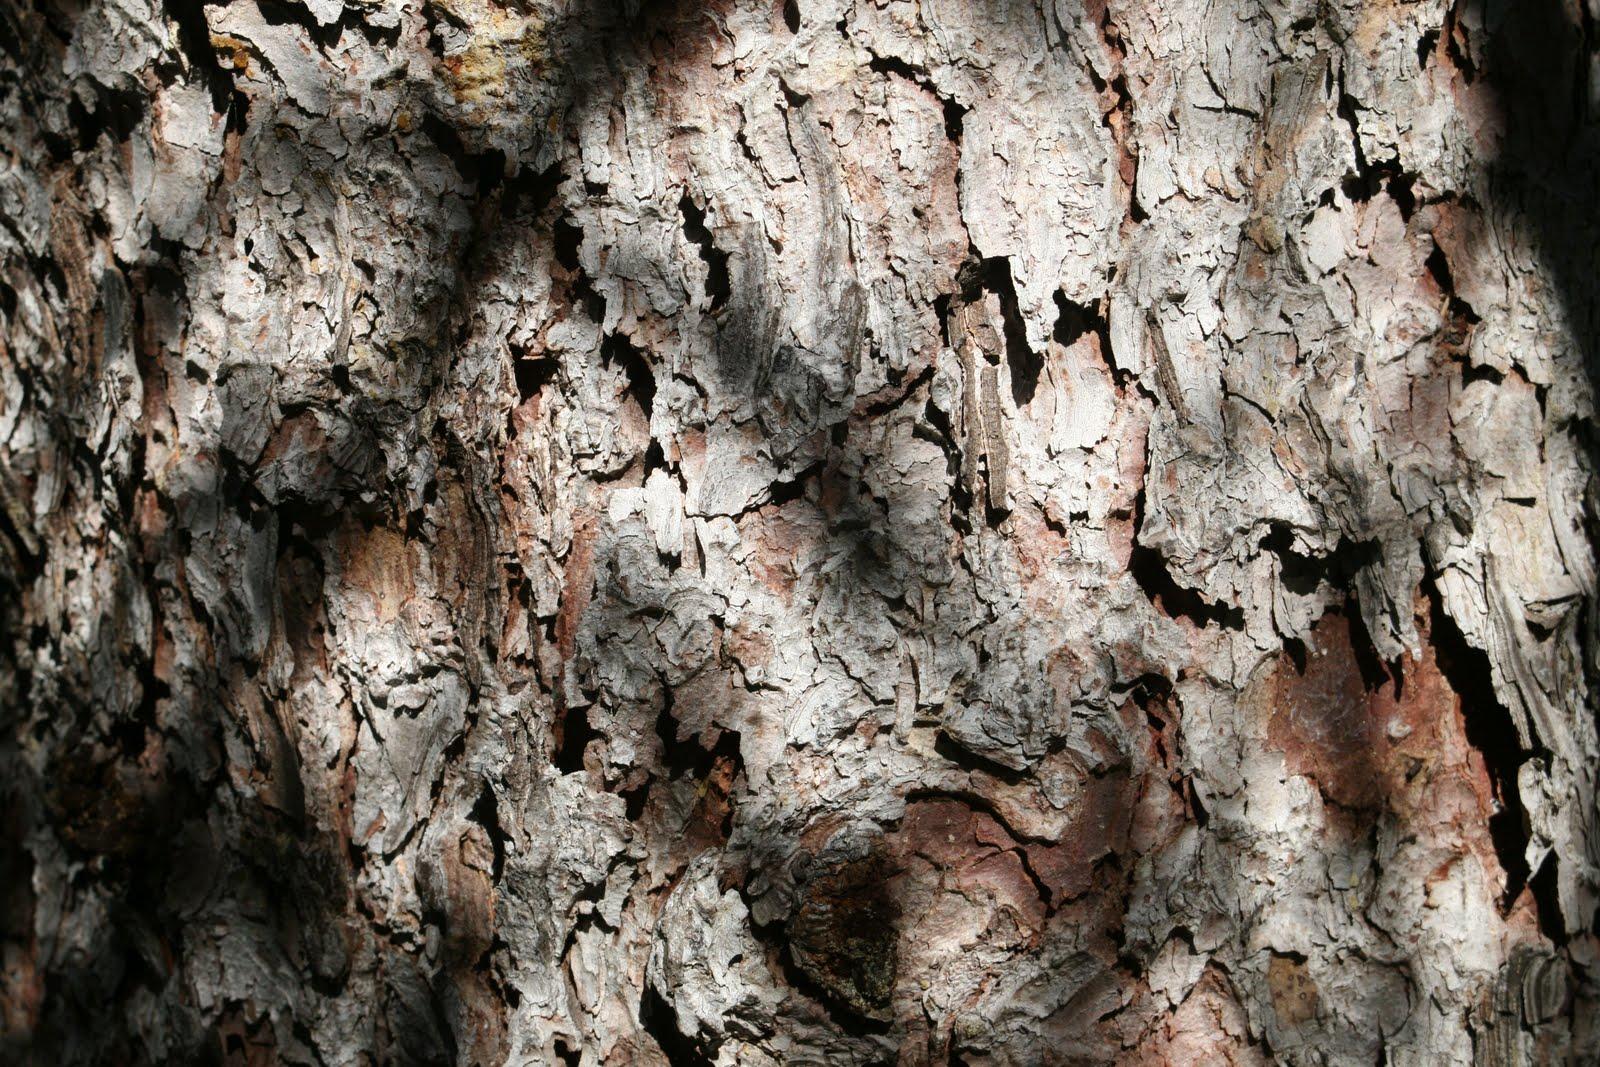 Tree Identification: Picea engelmanii - Englemann's Spruce